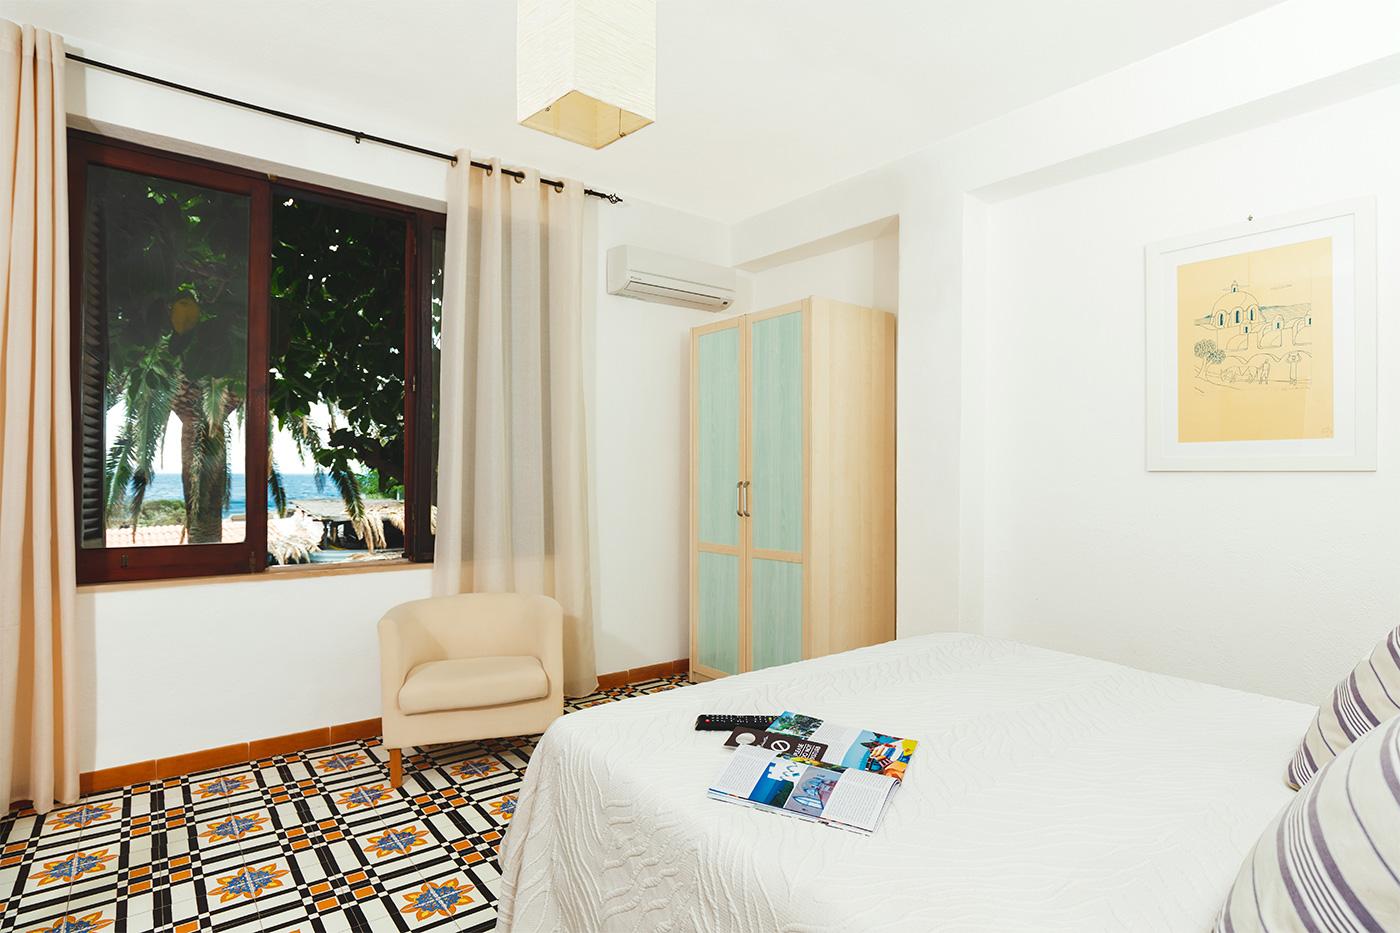 Camera standard hotel 3 stelle Giardino Eden Ischia